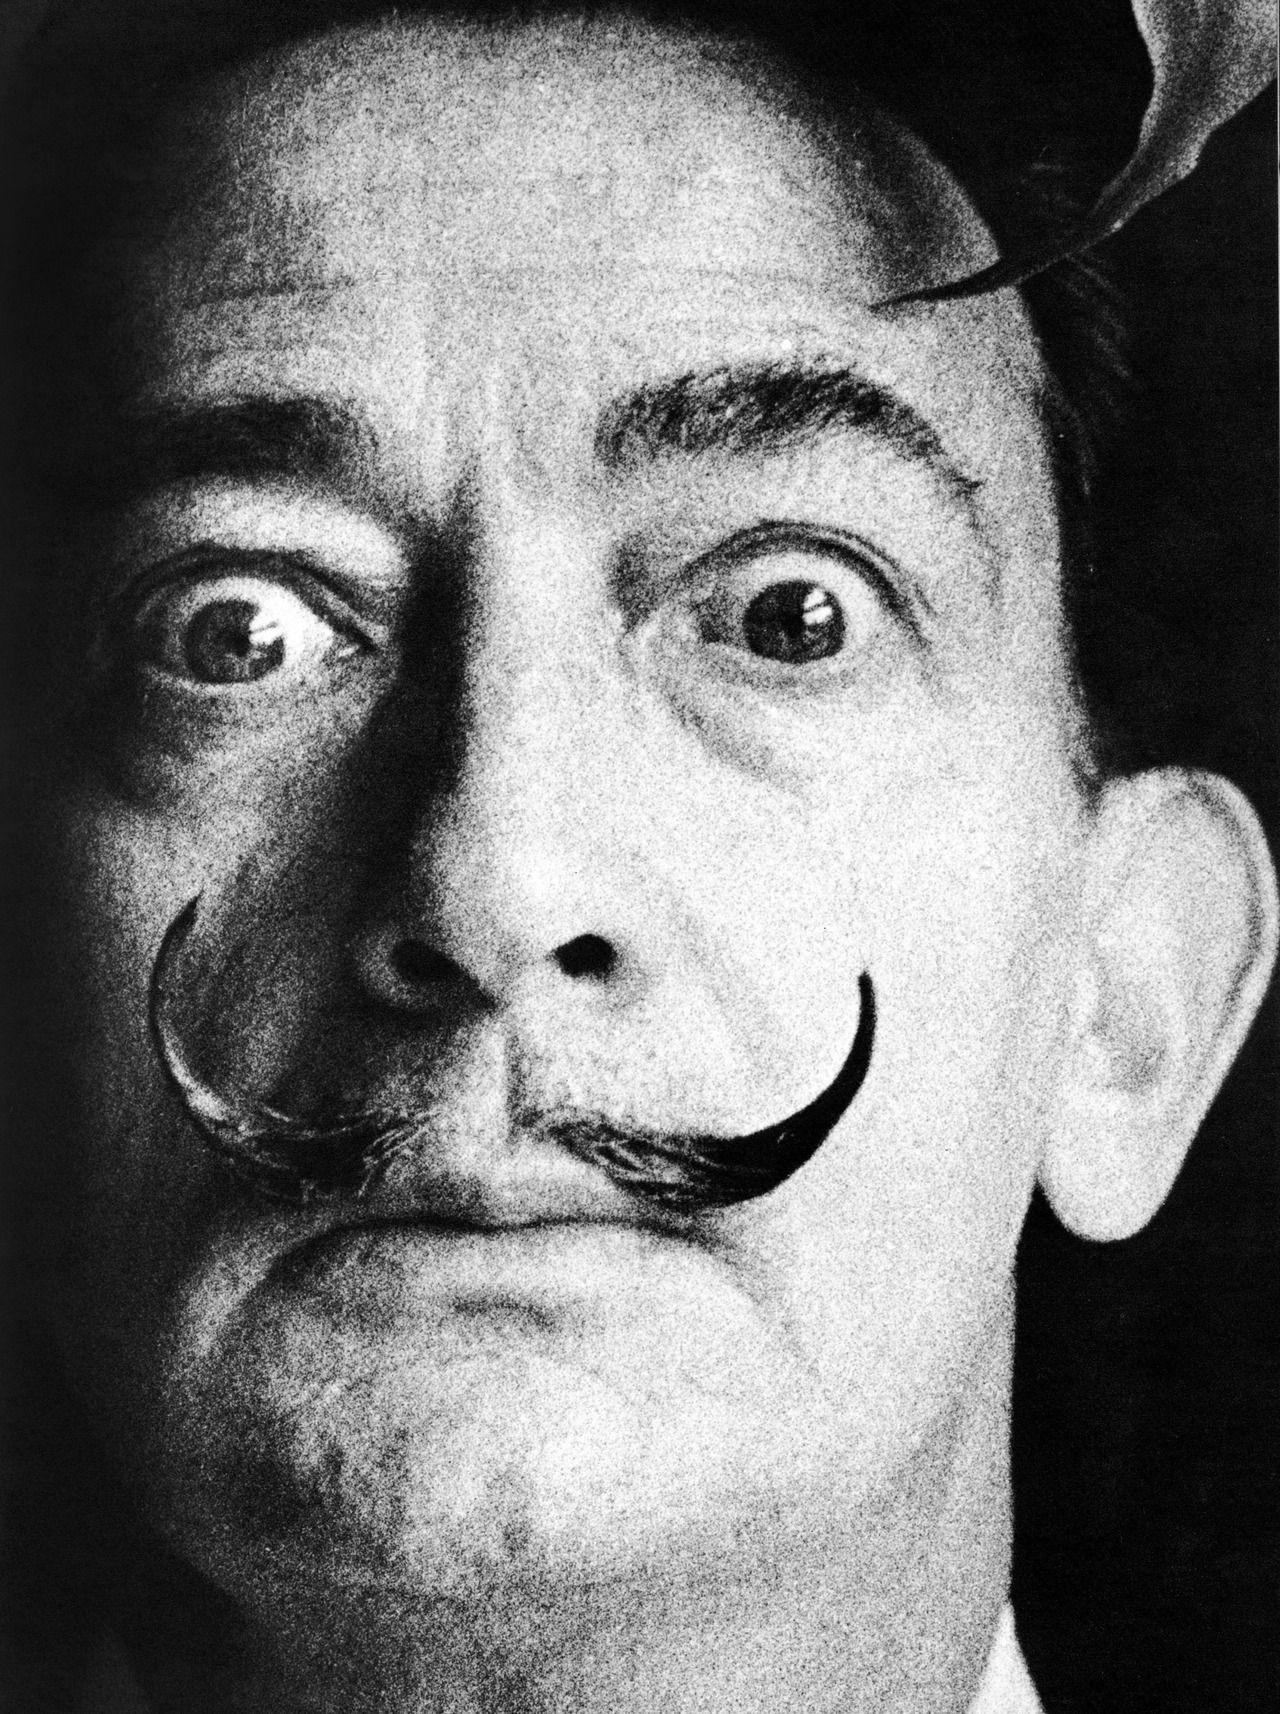 Old Pics Archive - multiple pics of Salvador Dali | Art ...